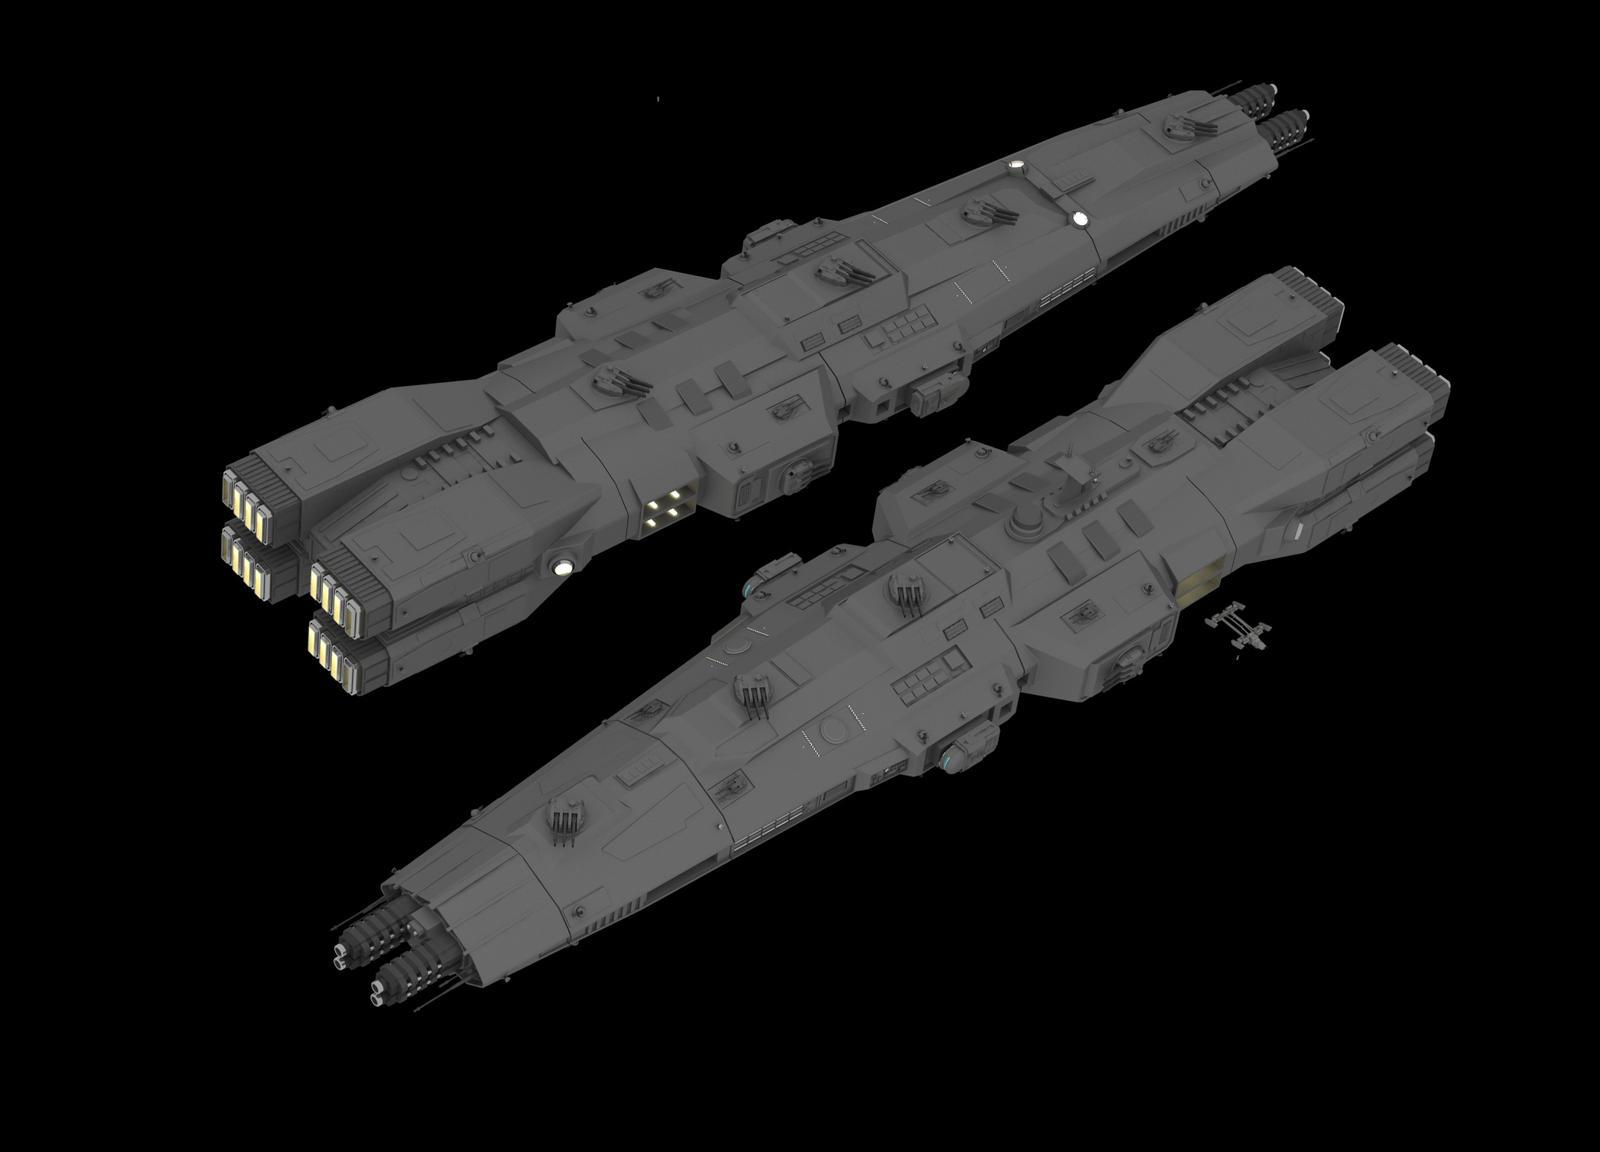 Eradicator Battleship by Quesocito